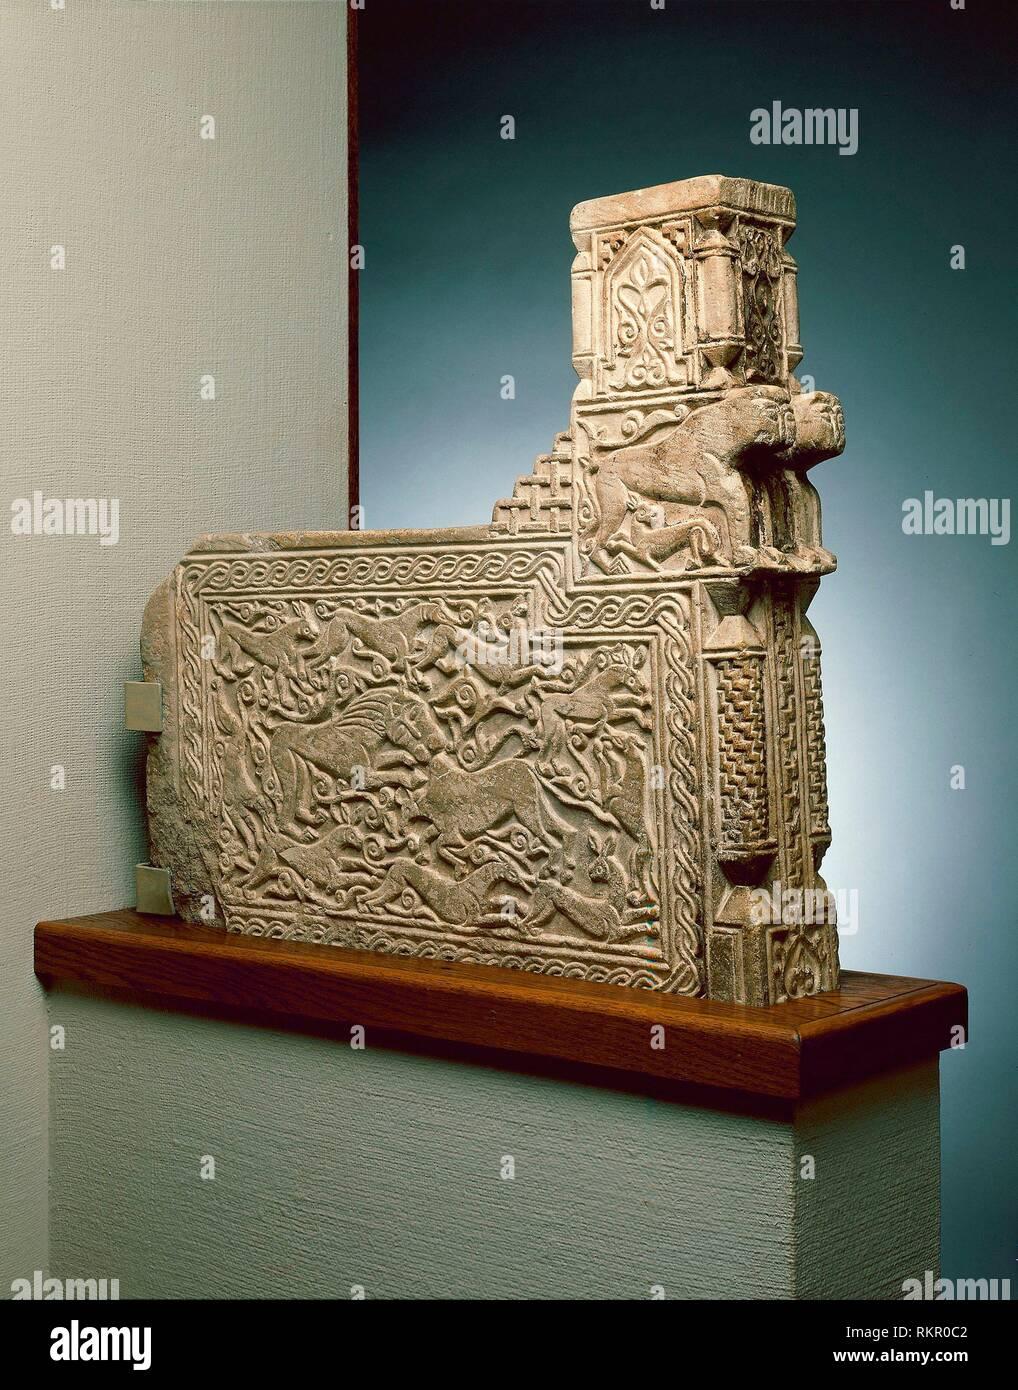 Architectural Fragment - Ilkhanid dynasty (1256-1353), 13th century - Iran probobly Hamadan - Artist: Islamic, Origin: Iran, Date: 1201-1400, Medium: Stock Photo